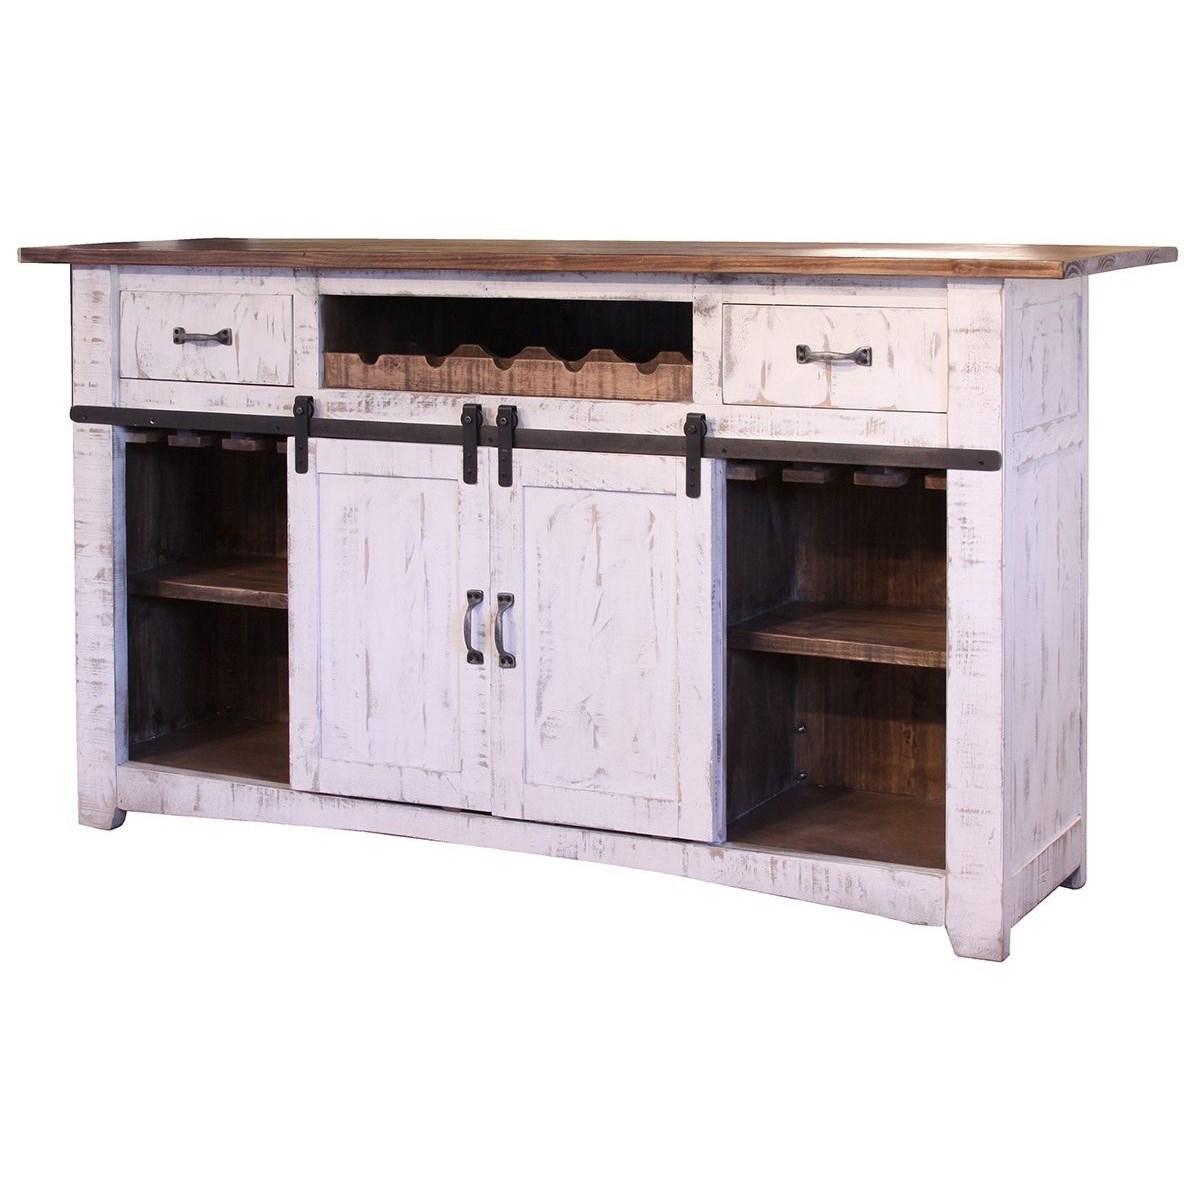 International furniture direct pueblo ifd360bar wooden bar for Furniture direct